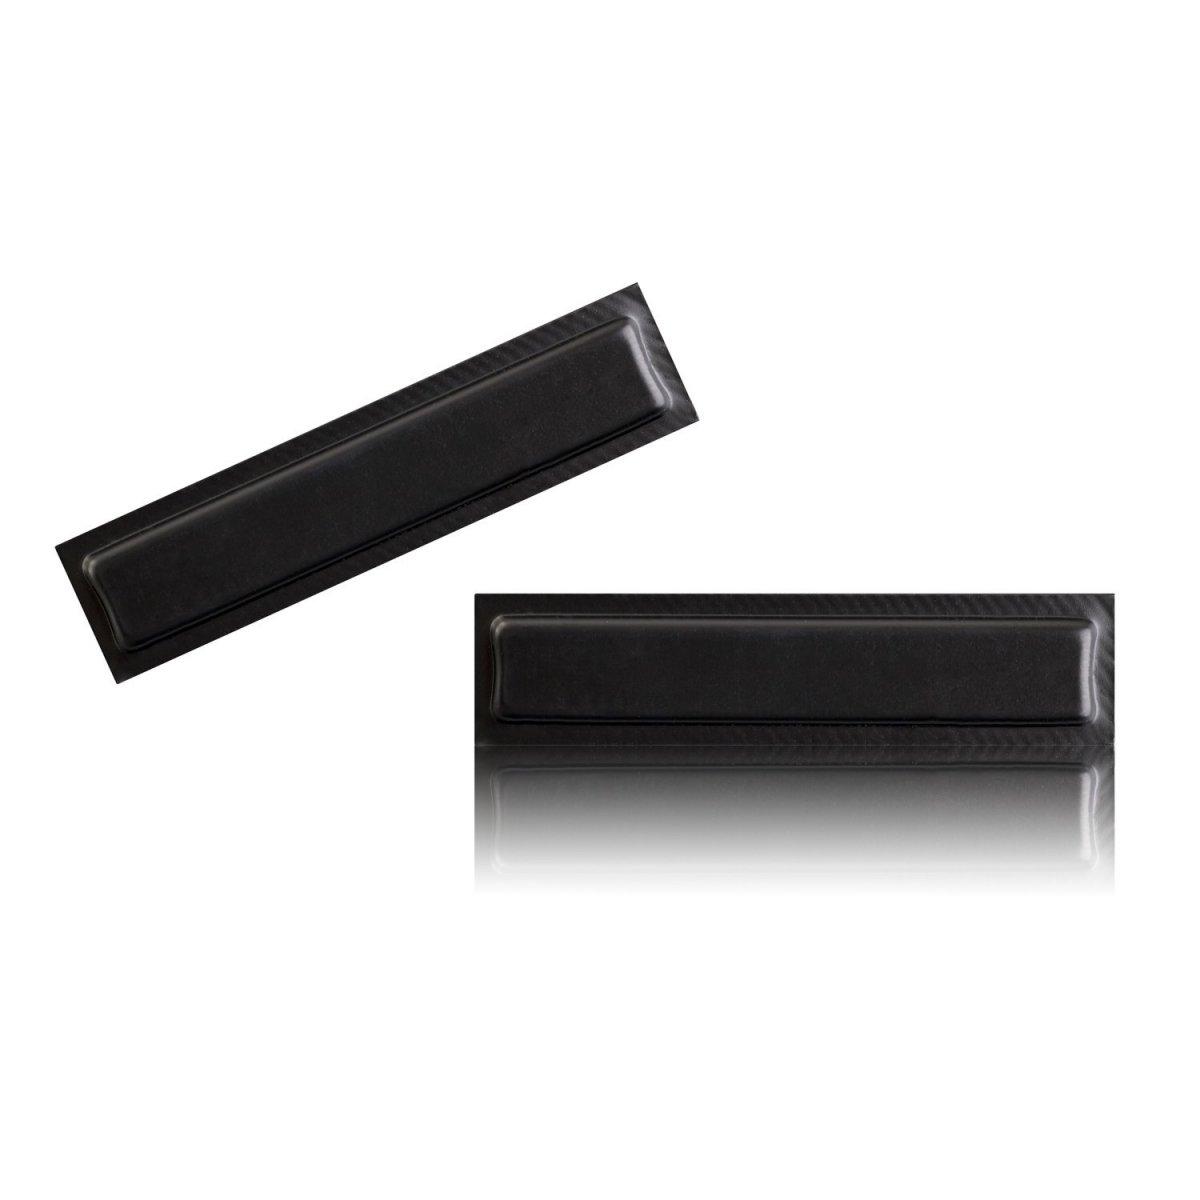 Alarme adesivo acústico magnético preto